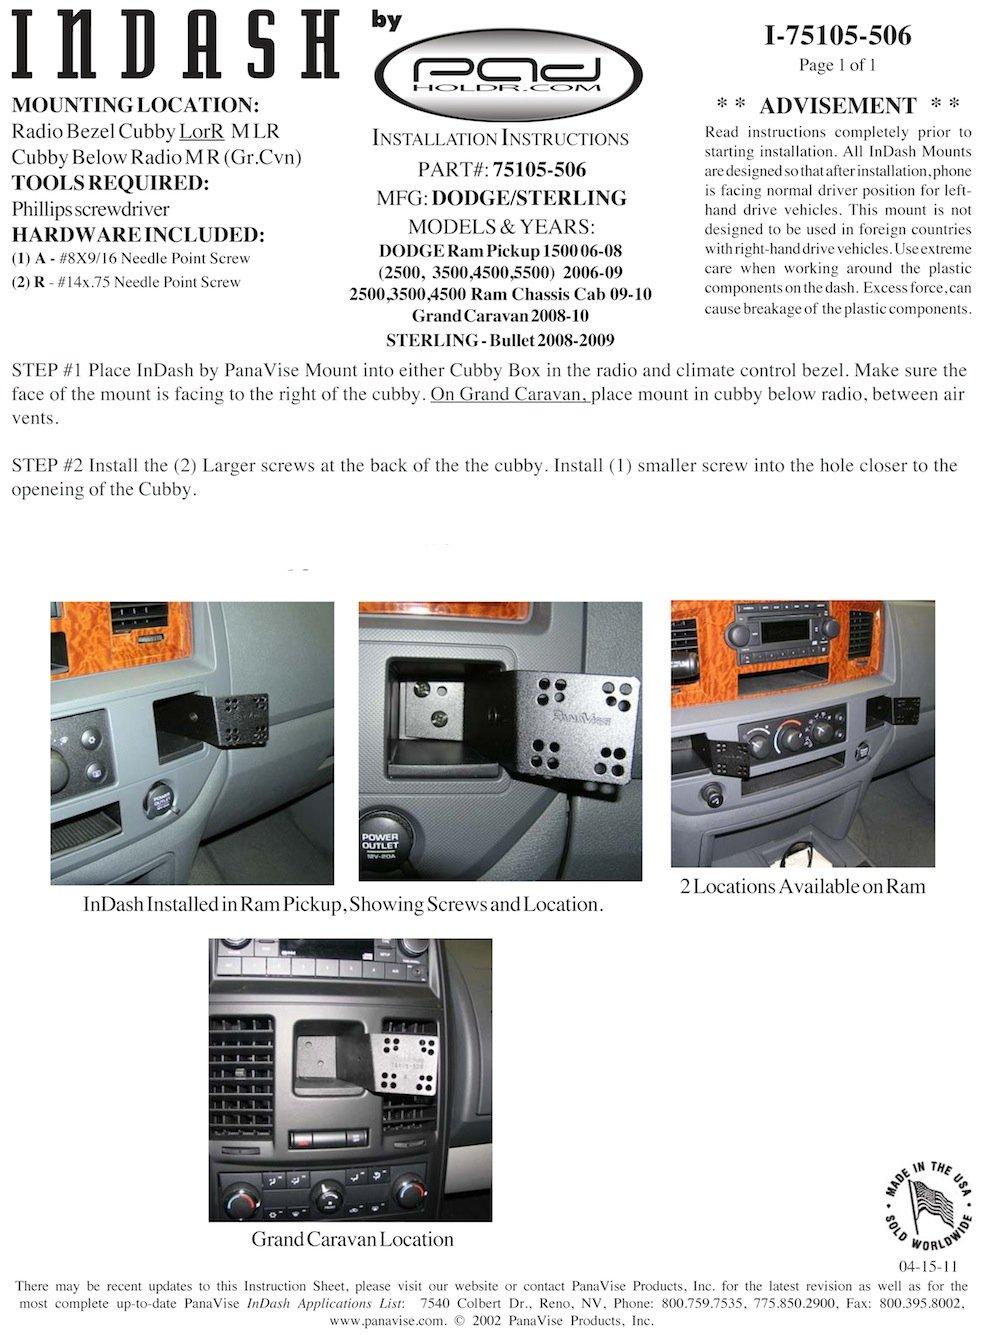 Padholdr Utility Series Premium Locking Tablet Dash Kit for 2008-2009 Sterling Truck Bullet Pad Holdr PHU3275105-506-3